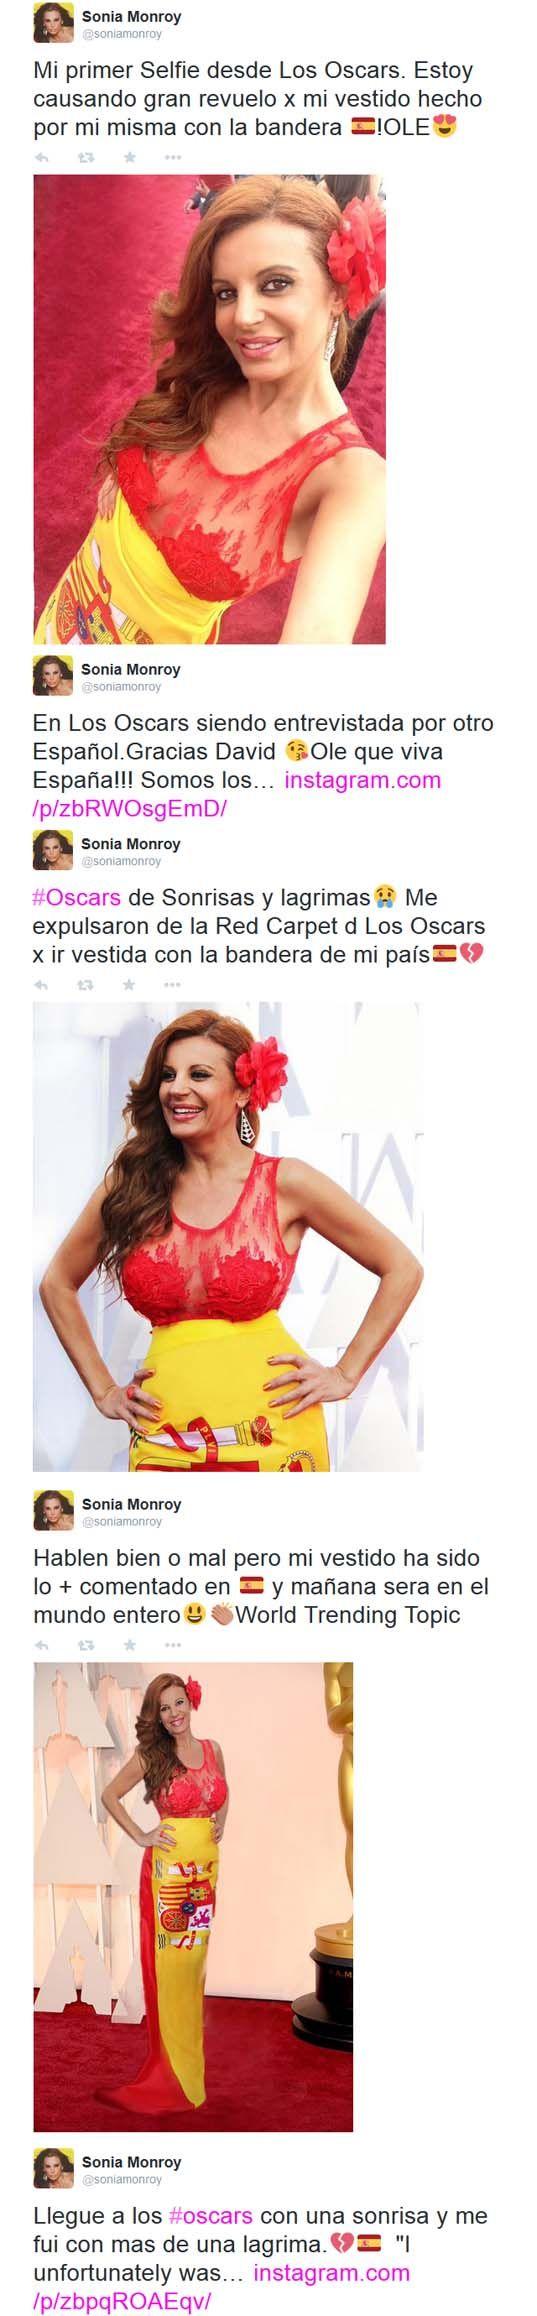 SUELY  cariñet Sonia-Monroy-Oscar-tuits-537